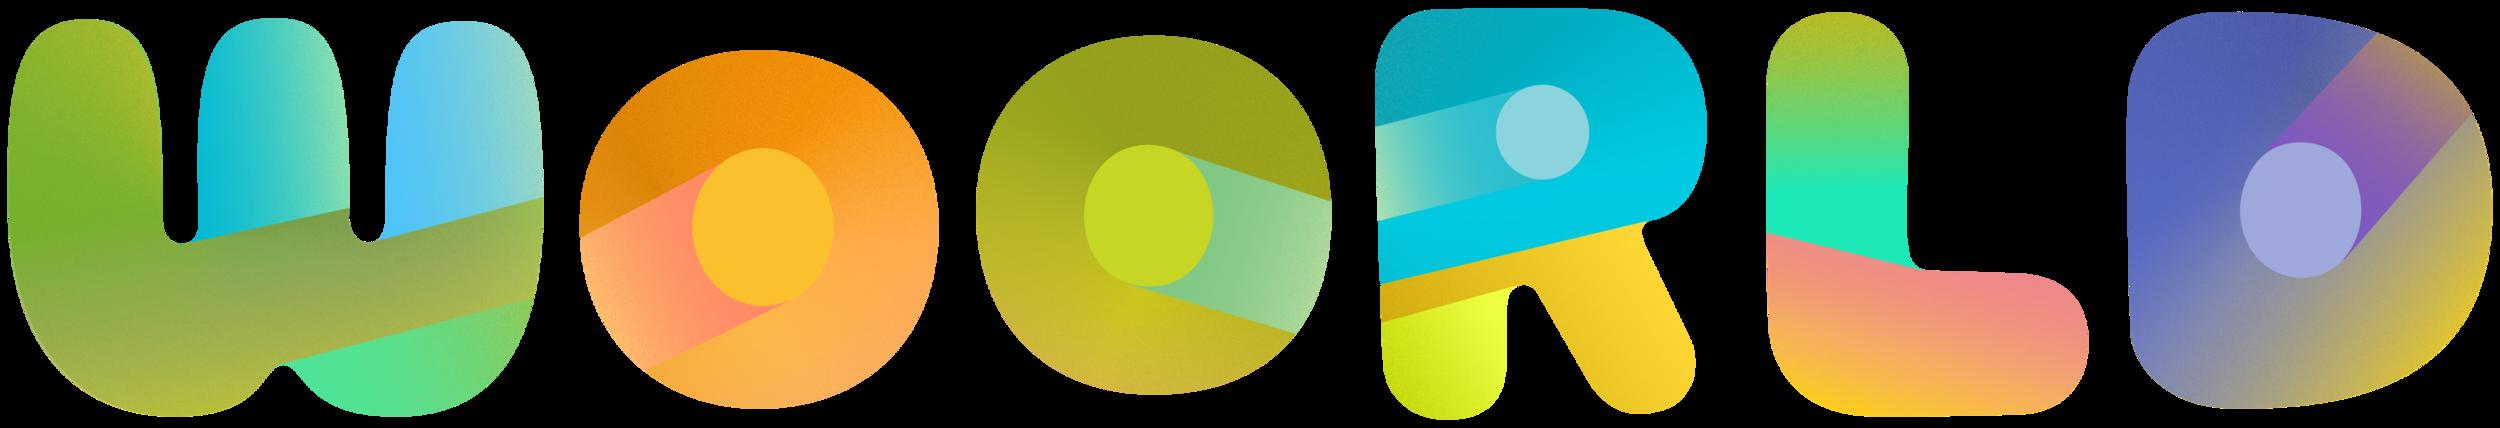 Woorld_logo.png